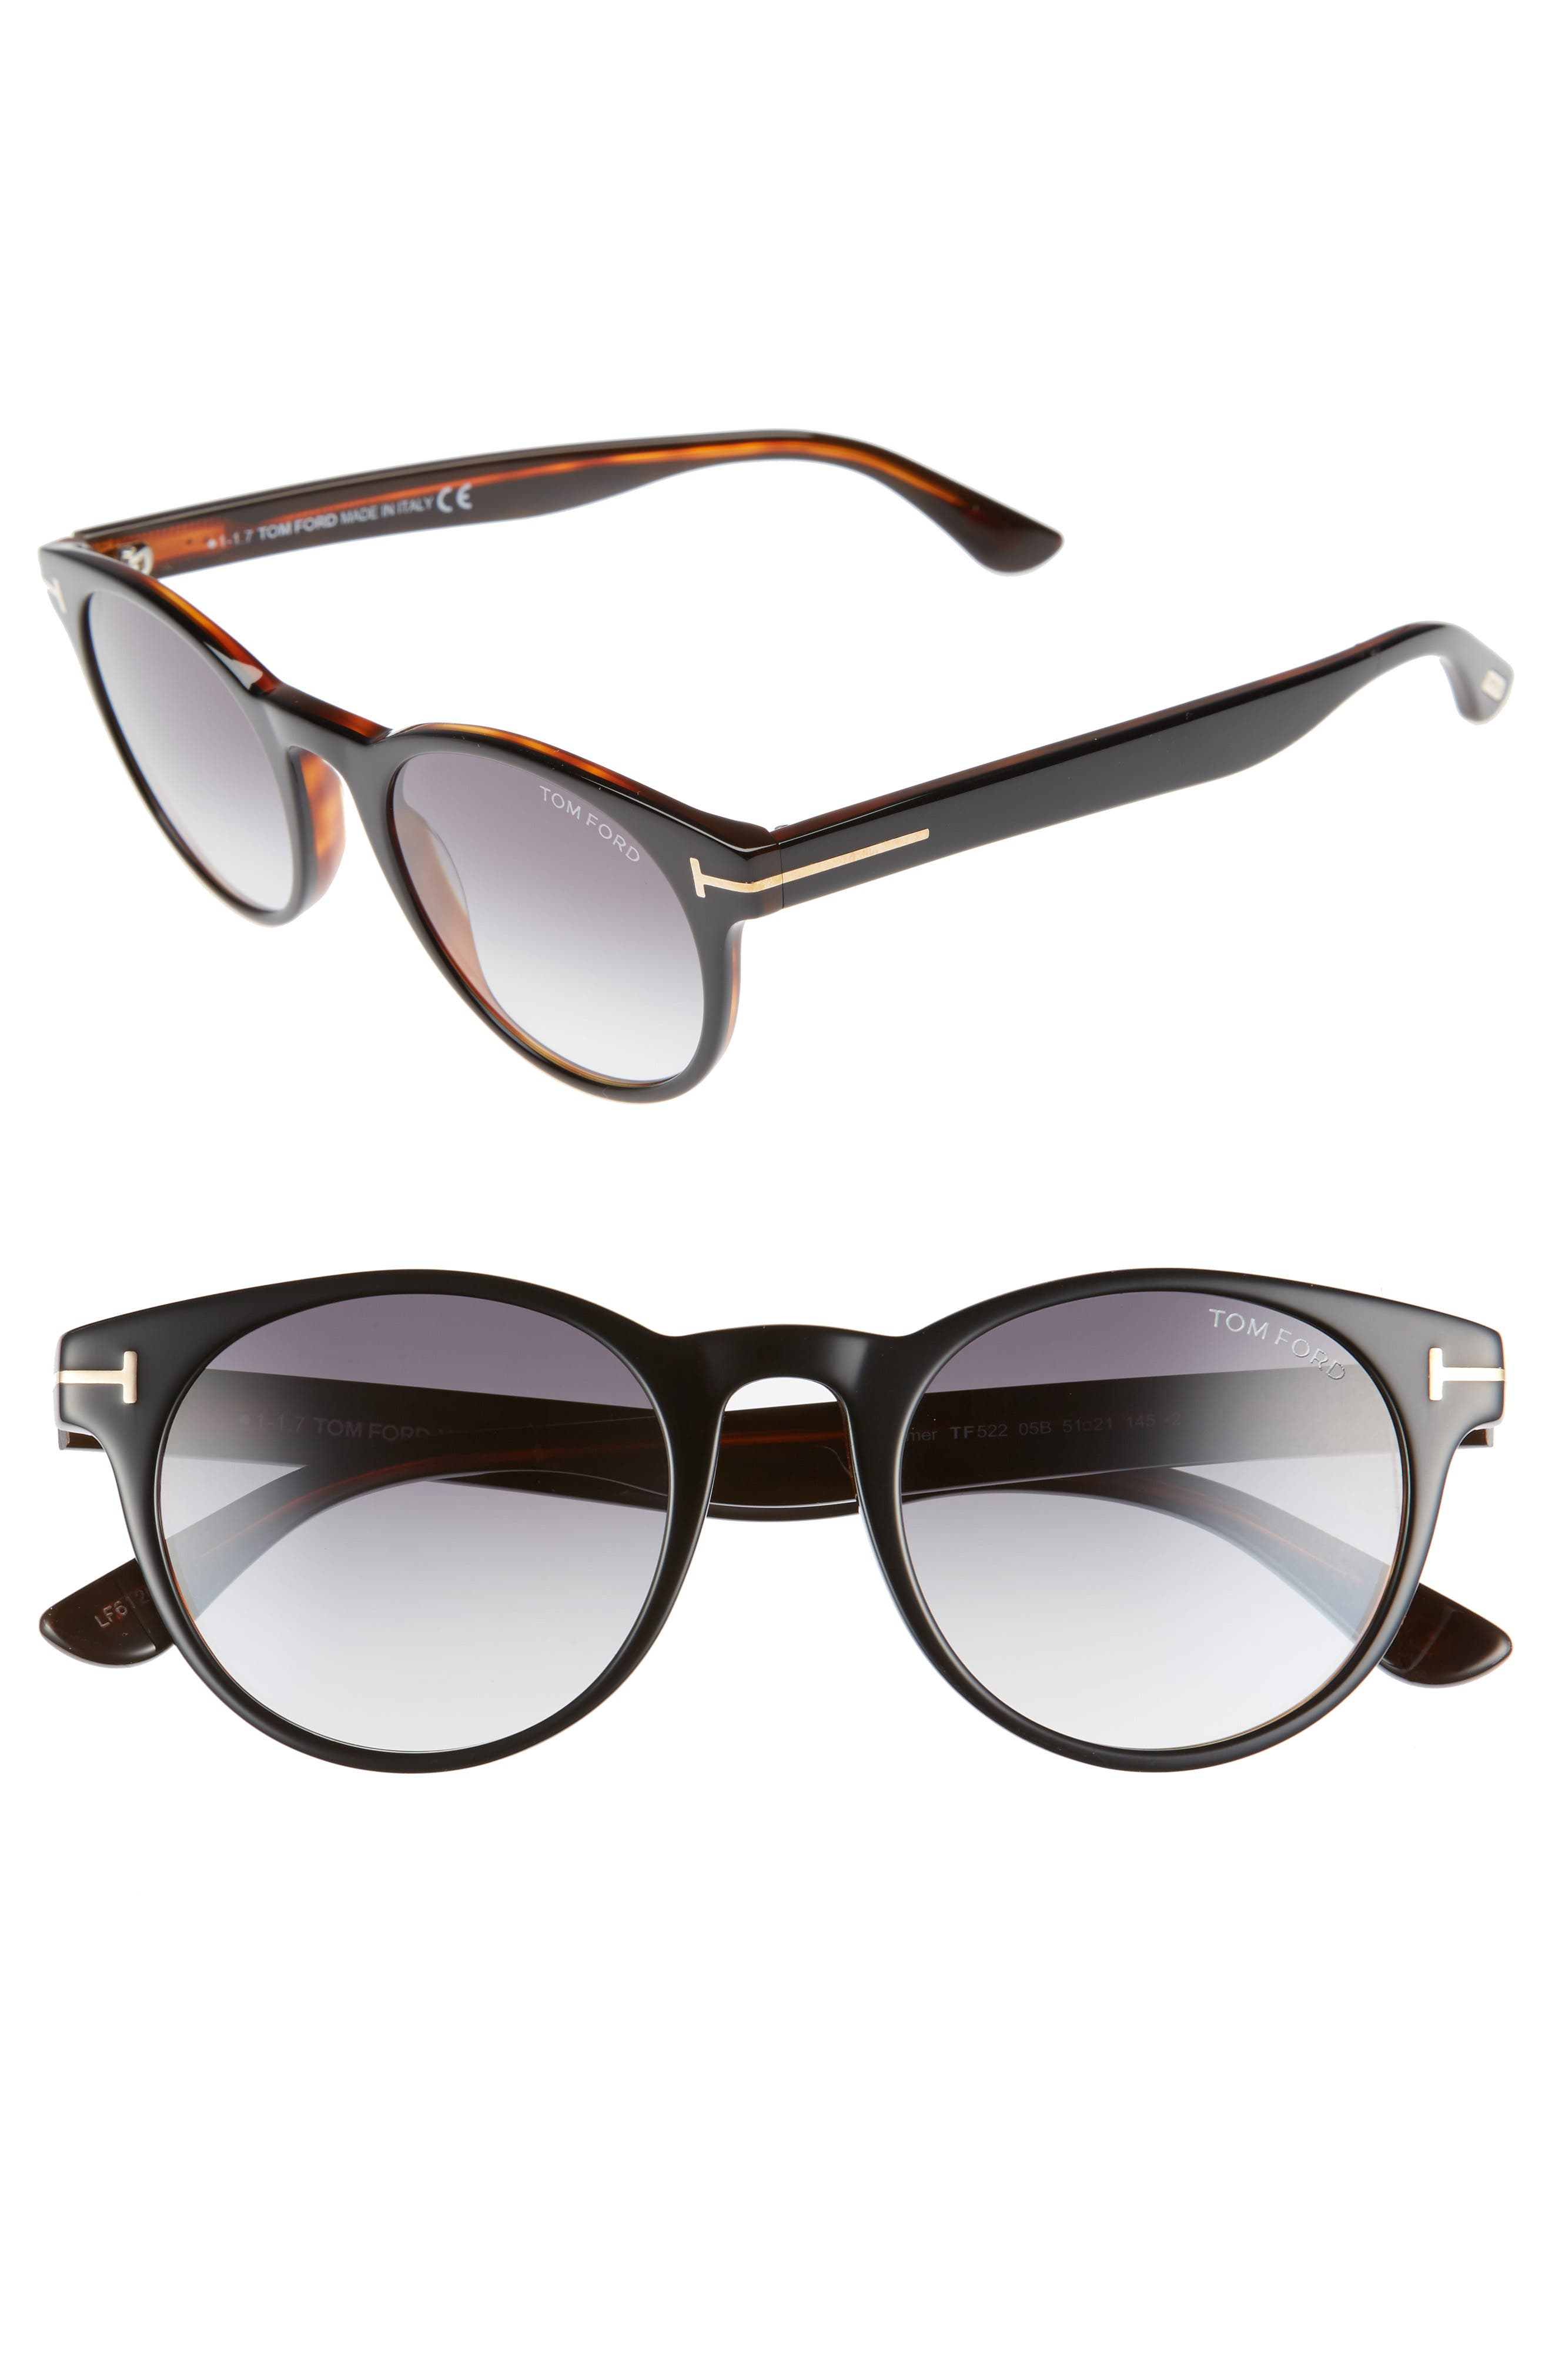 Palmer 51mm Gradient Lens Sunglasses,                             Main thumbnail 1, color,                             Black/ Gradient Smoke